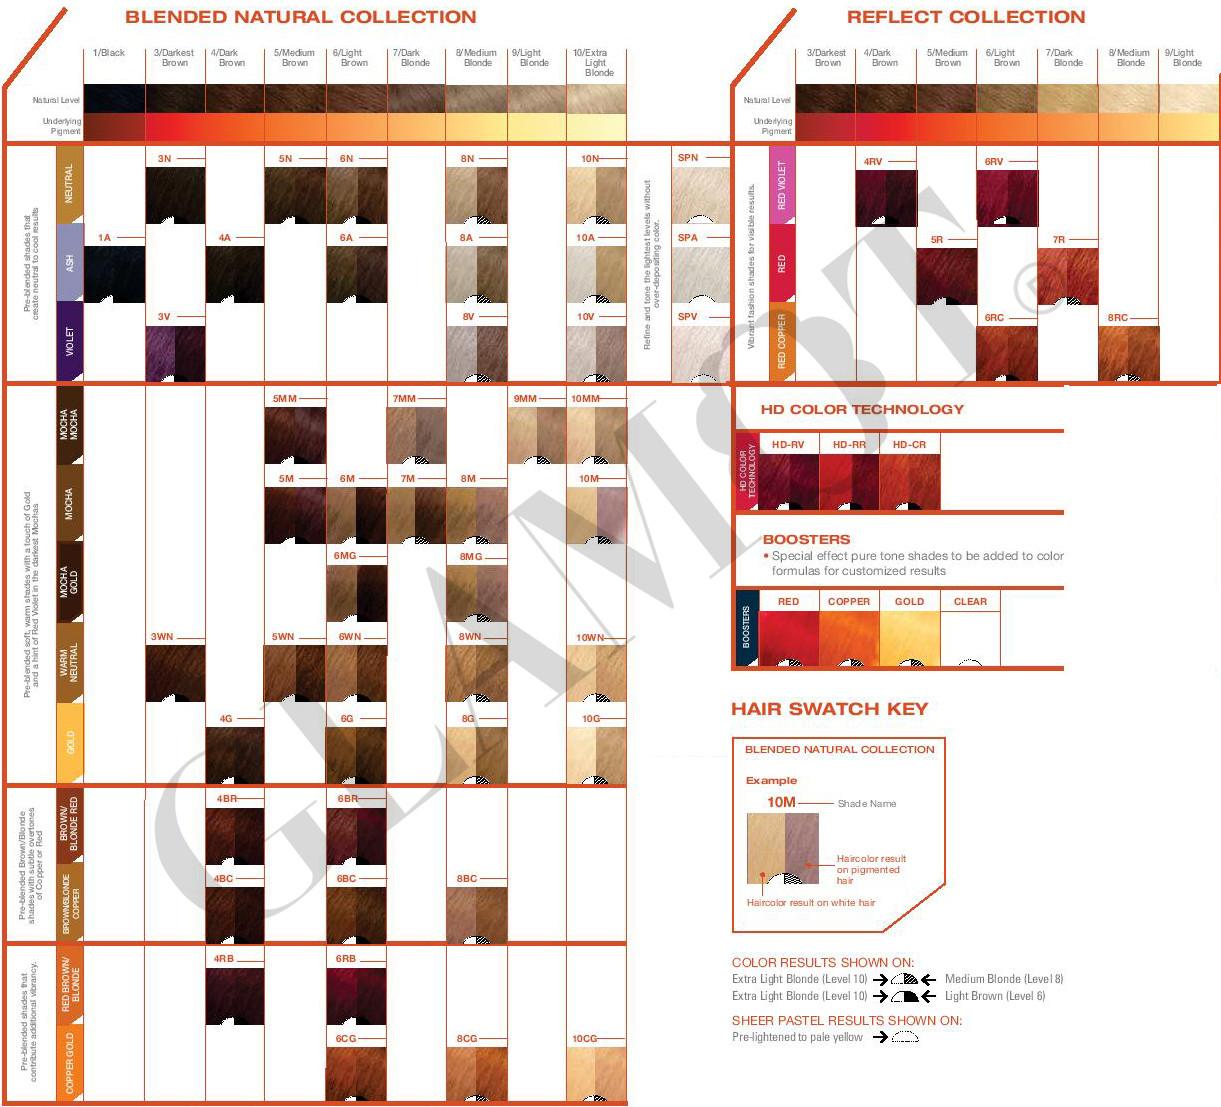 Matrix Color Sync Demi Color Glamotde